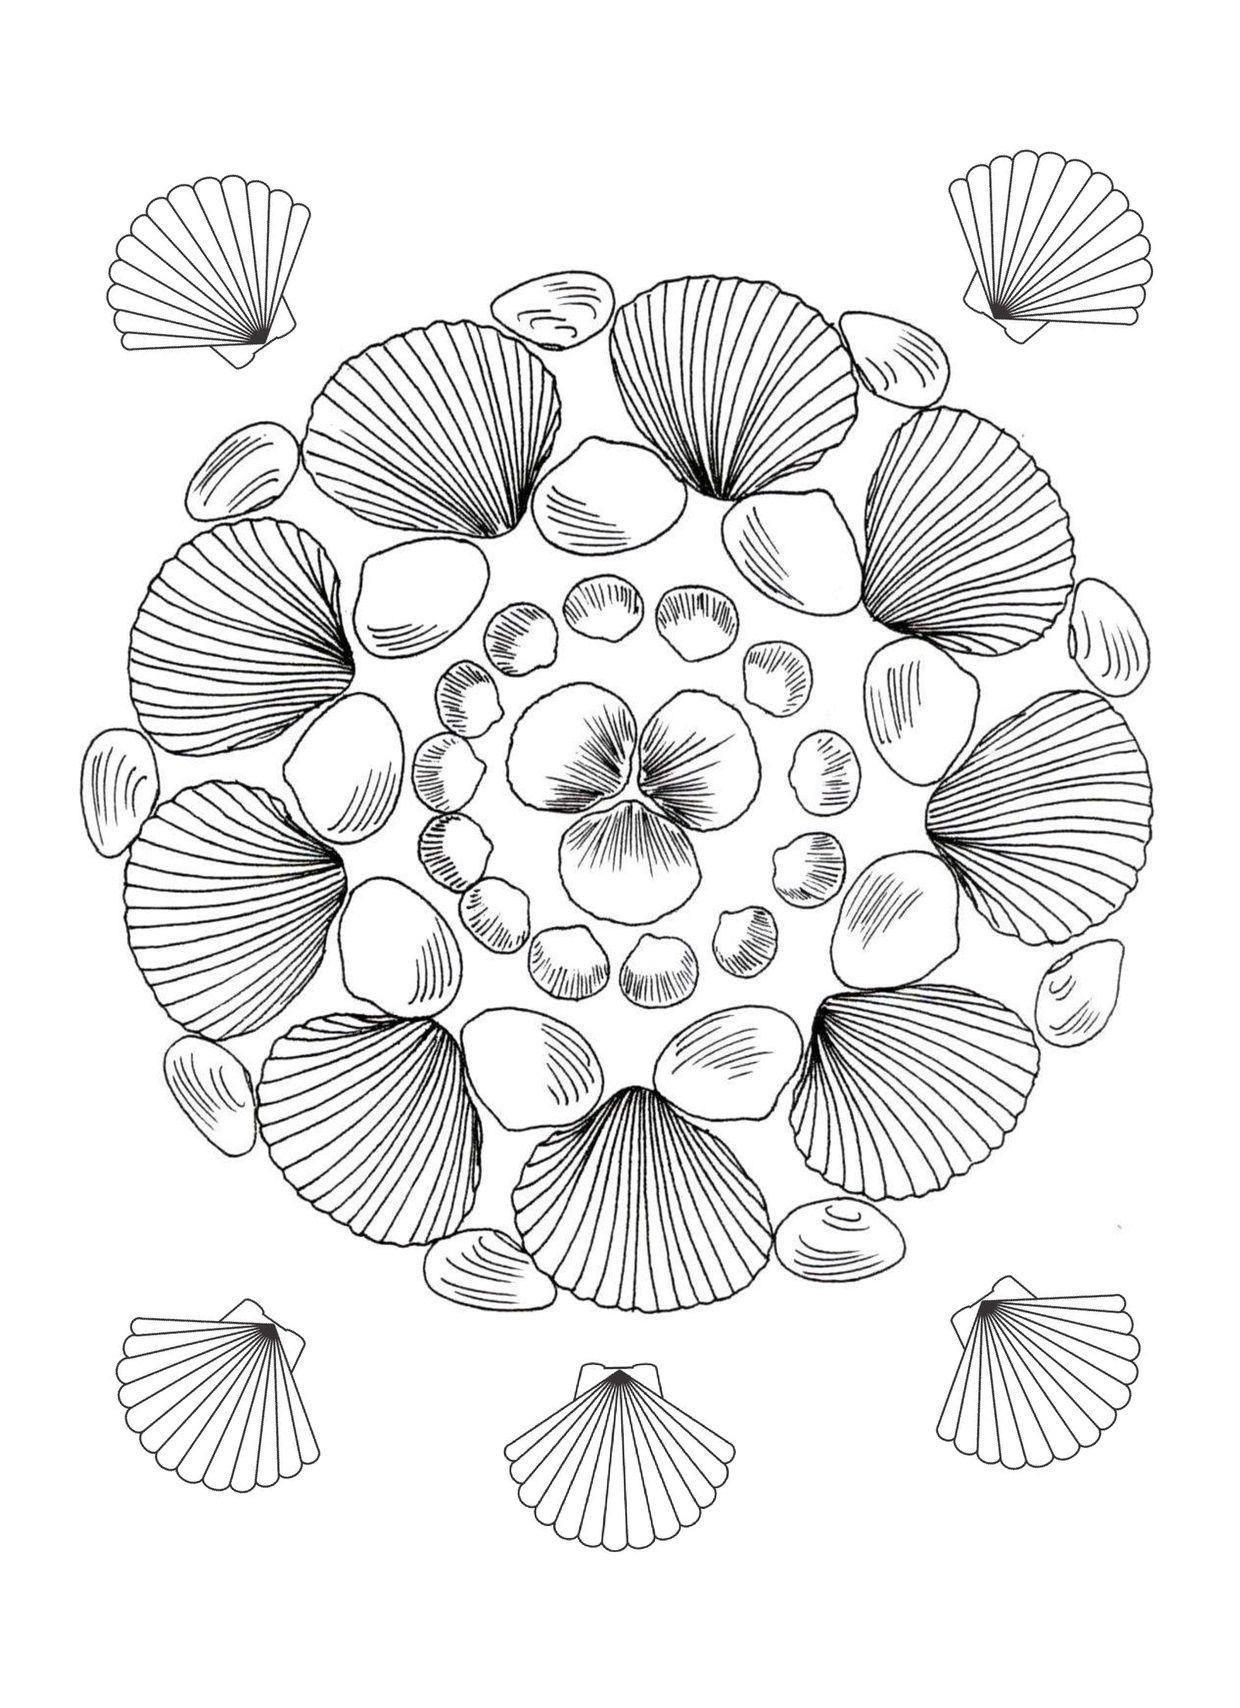 kleurplaten minions mandala